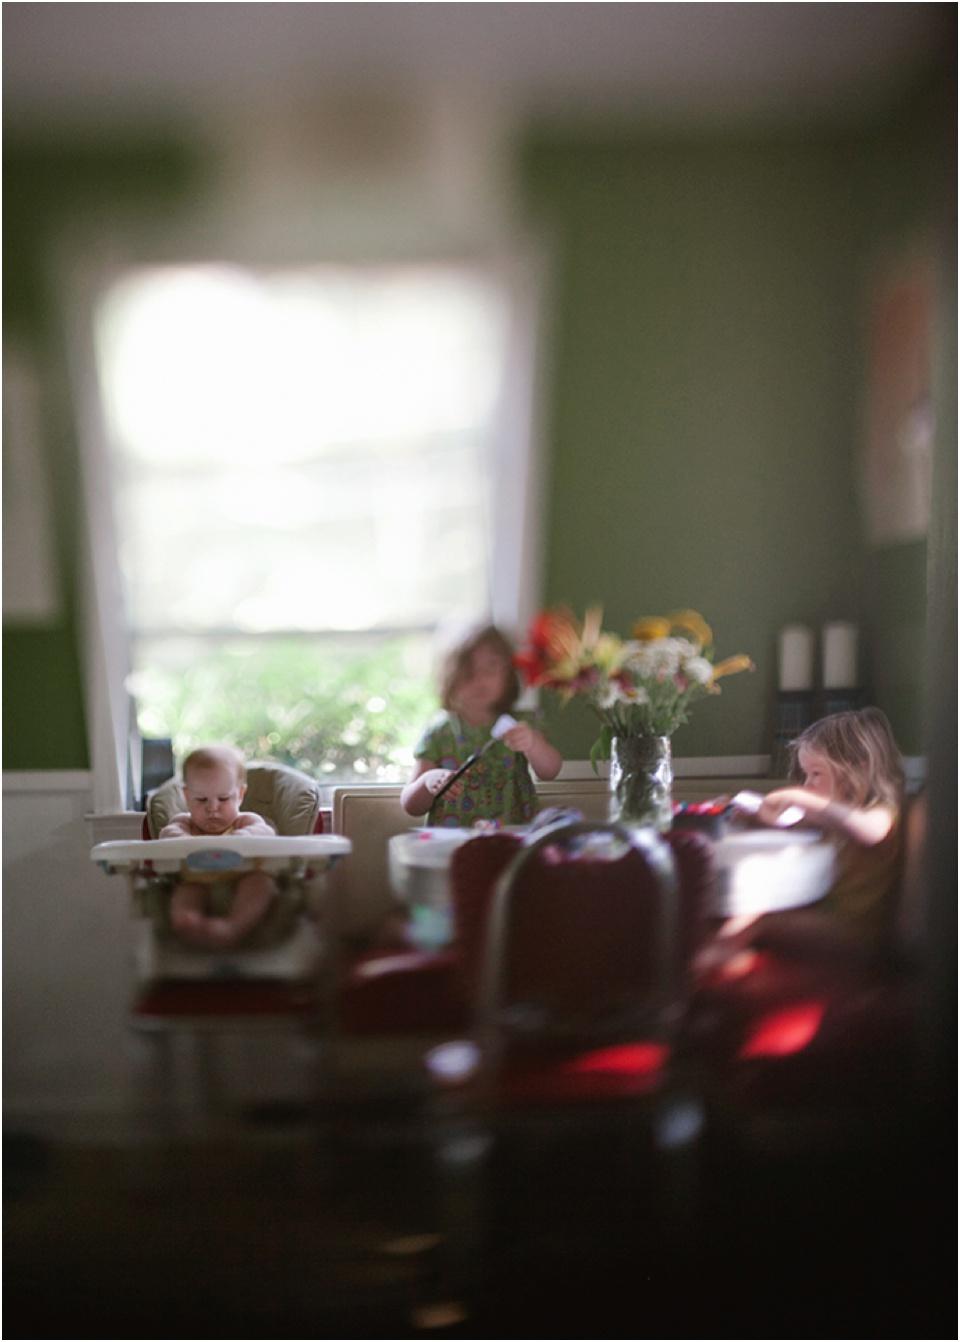 Copy of The Family Historian with Illuminate Classes image © Heather Robinson